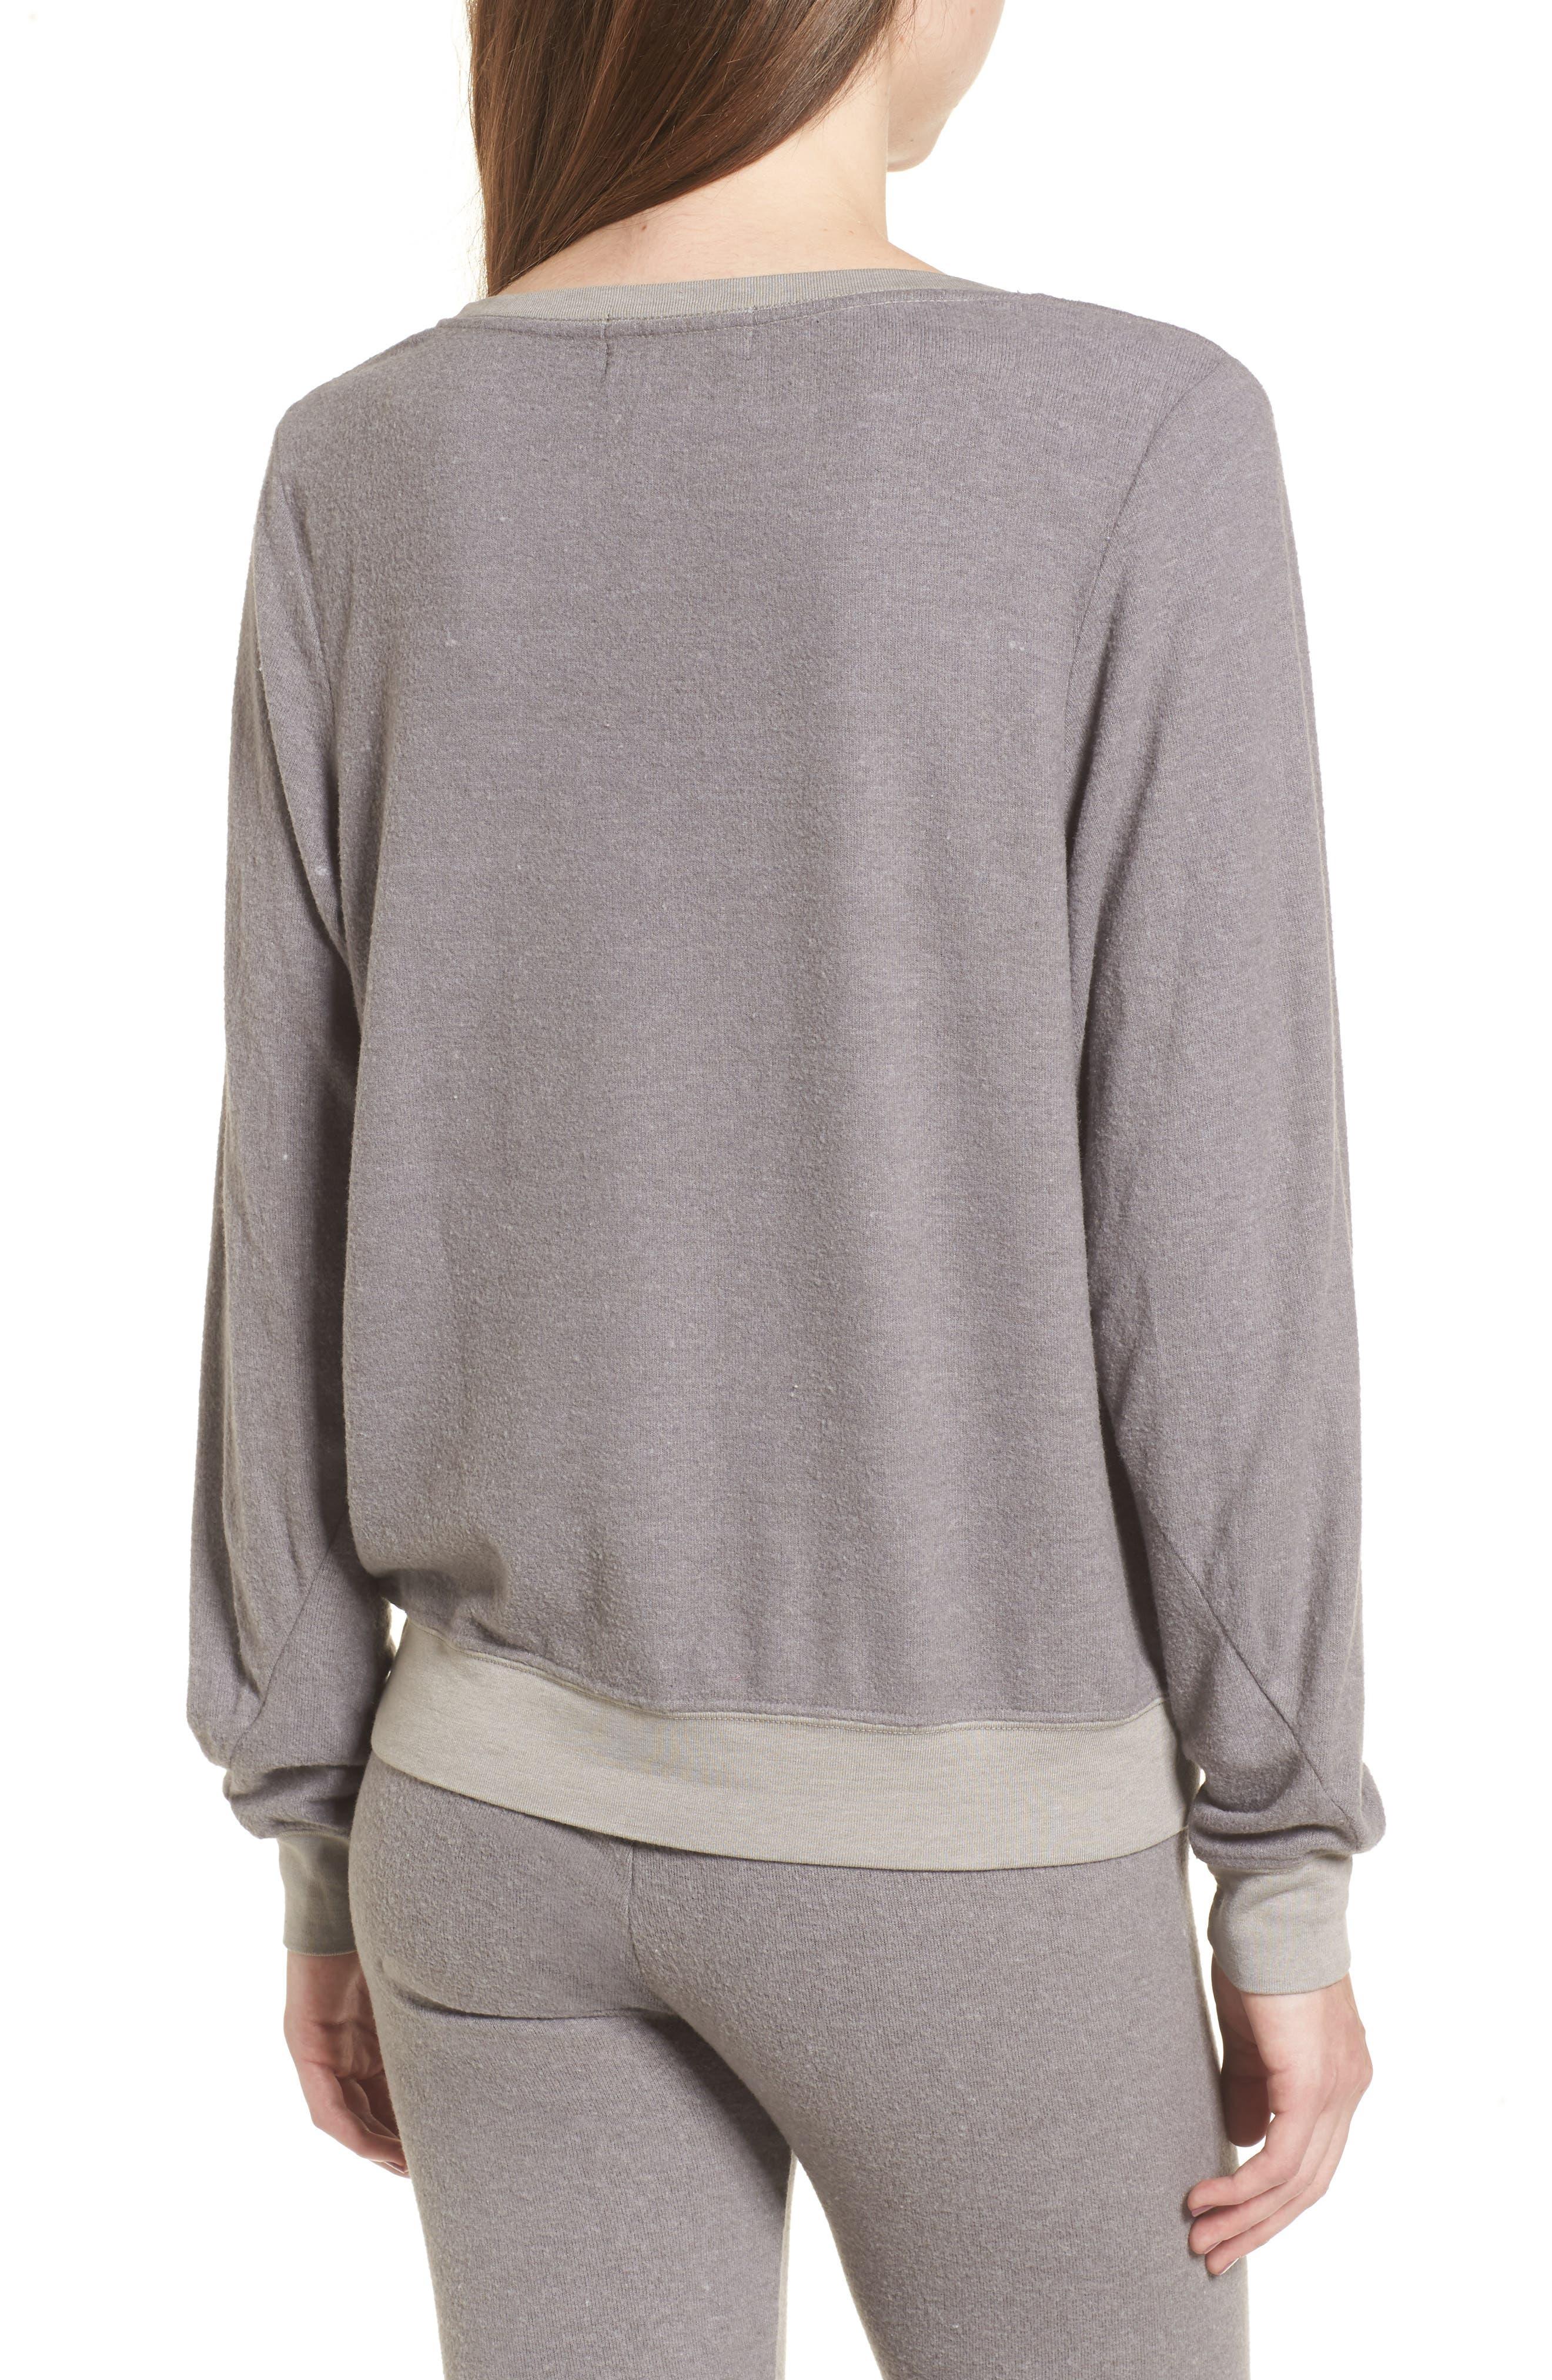 NYC Sweatshirt,                             Alternate thumbnail 2, color,